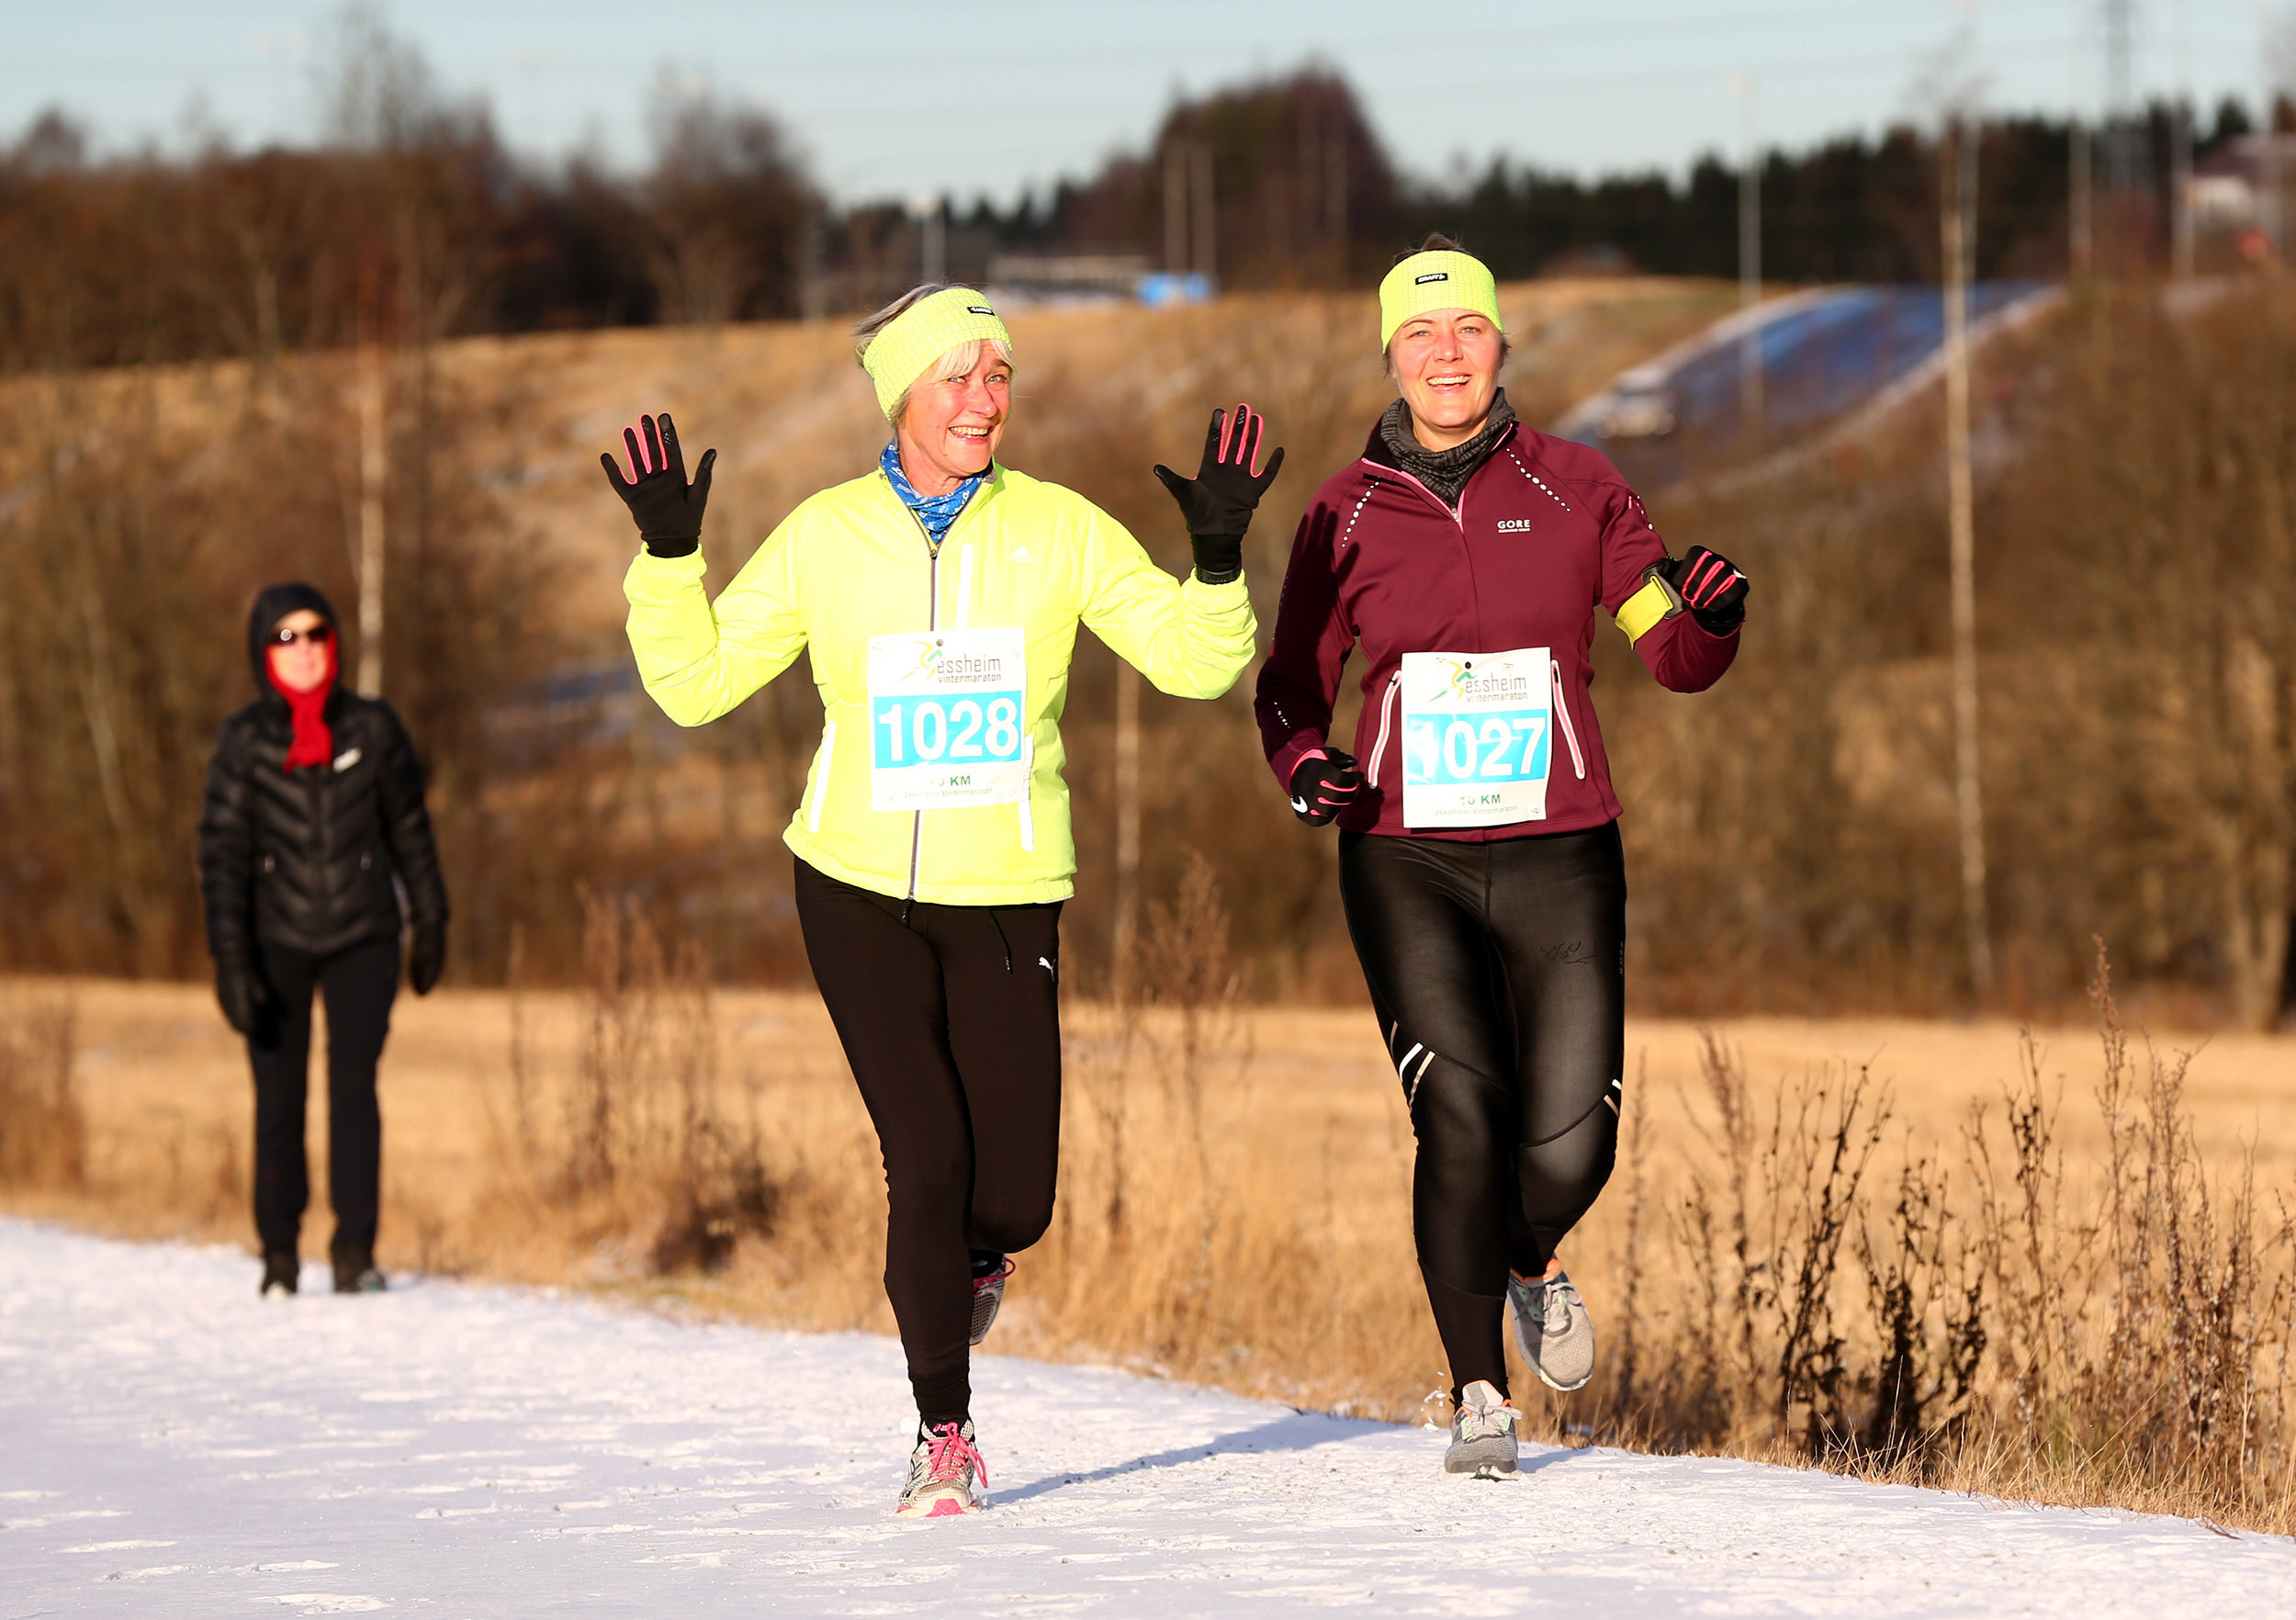 Vintermaraton252_Glade_damer_10km.jpg